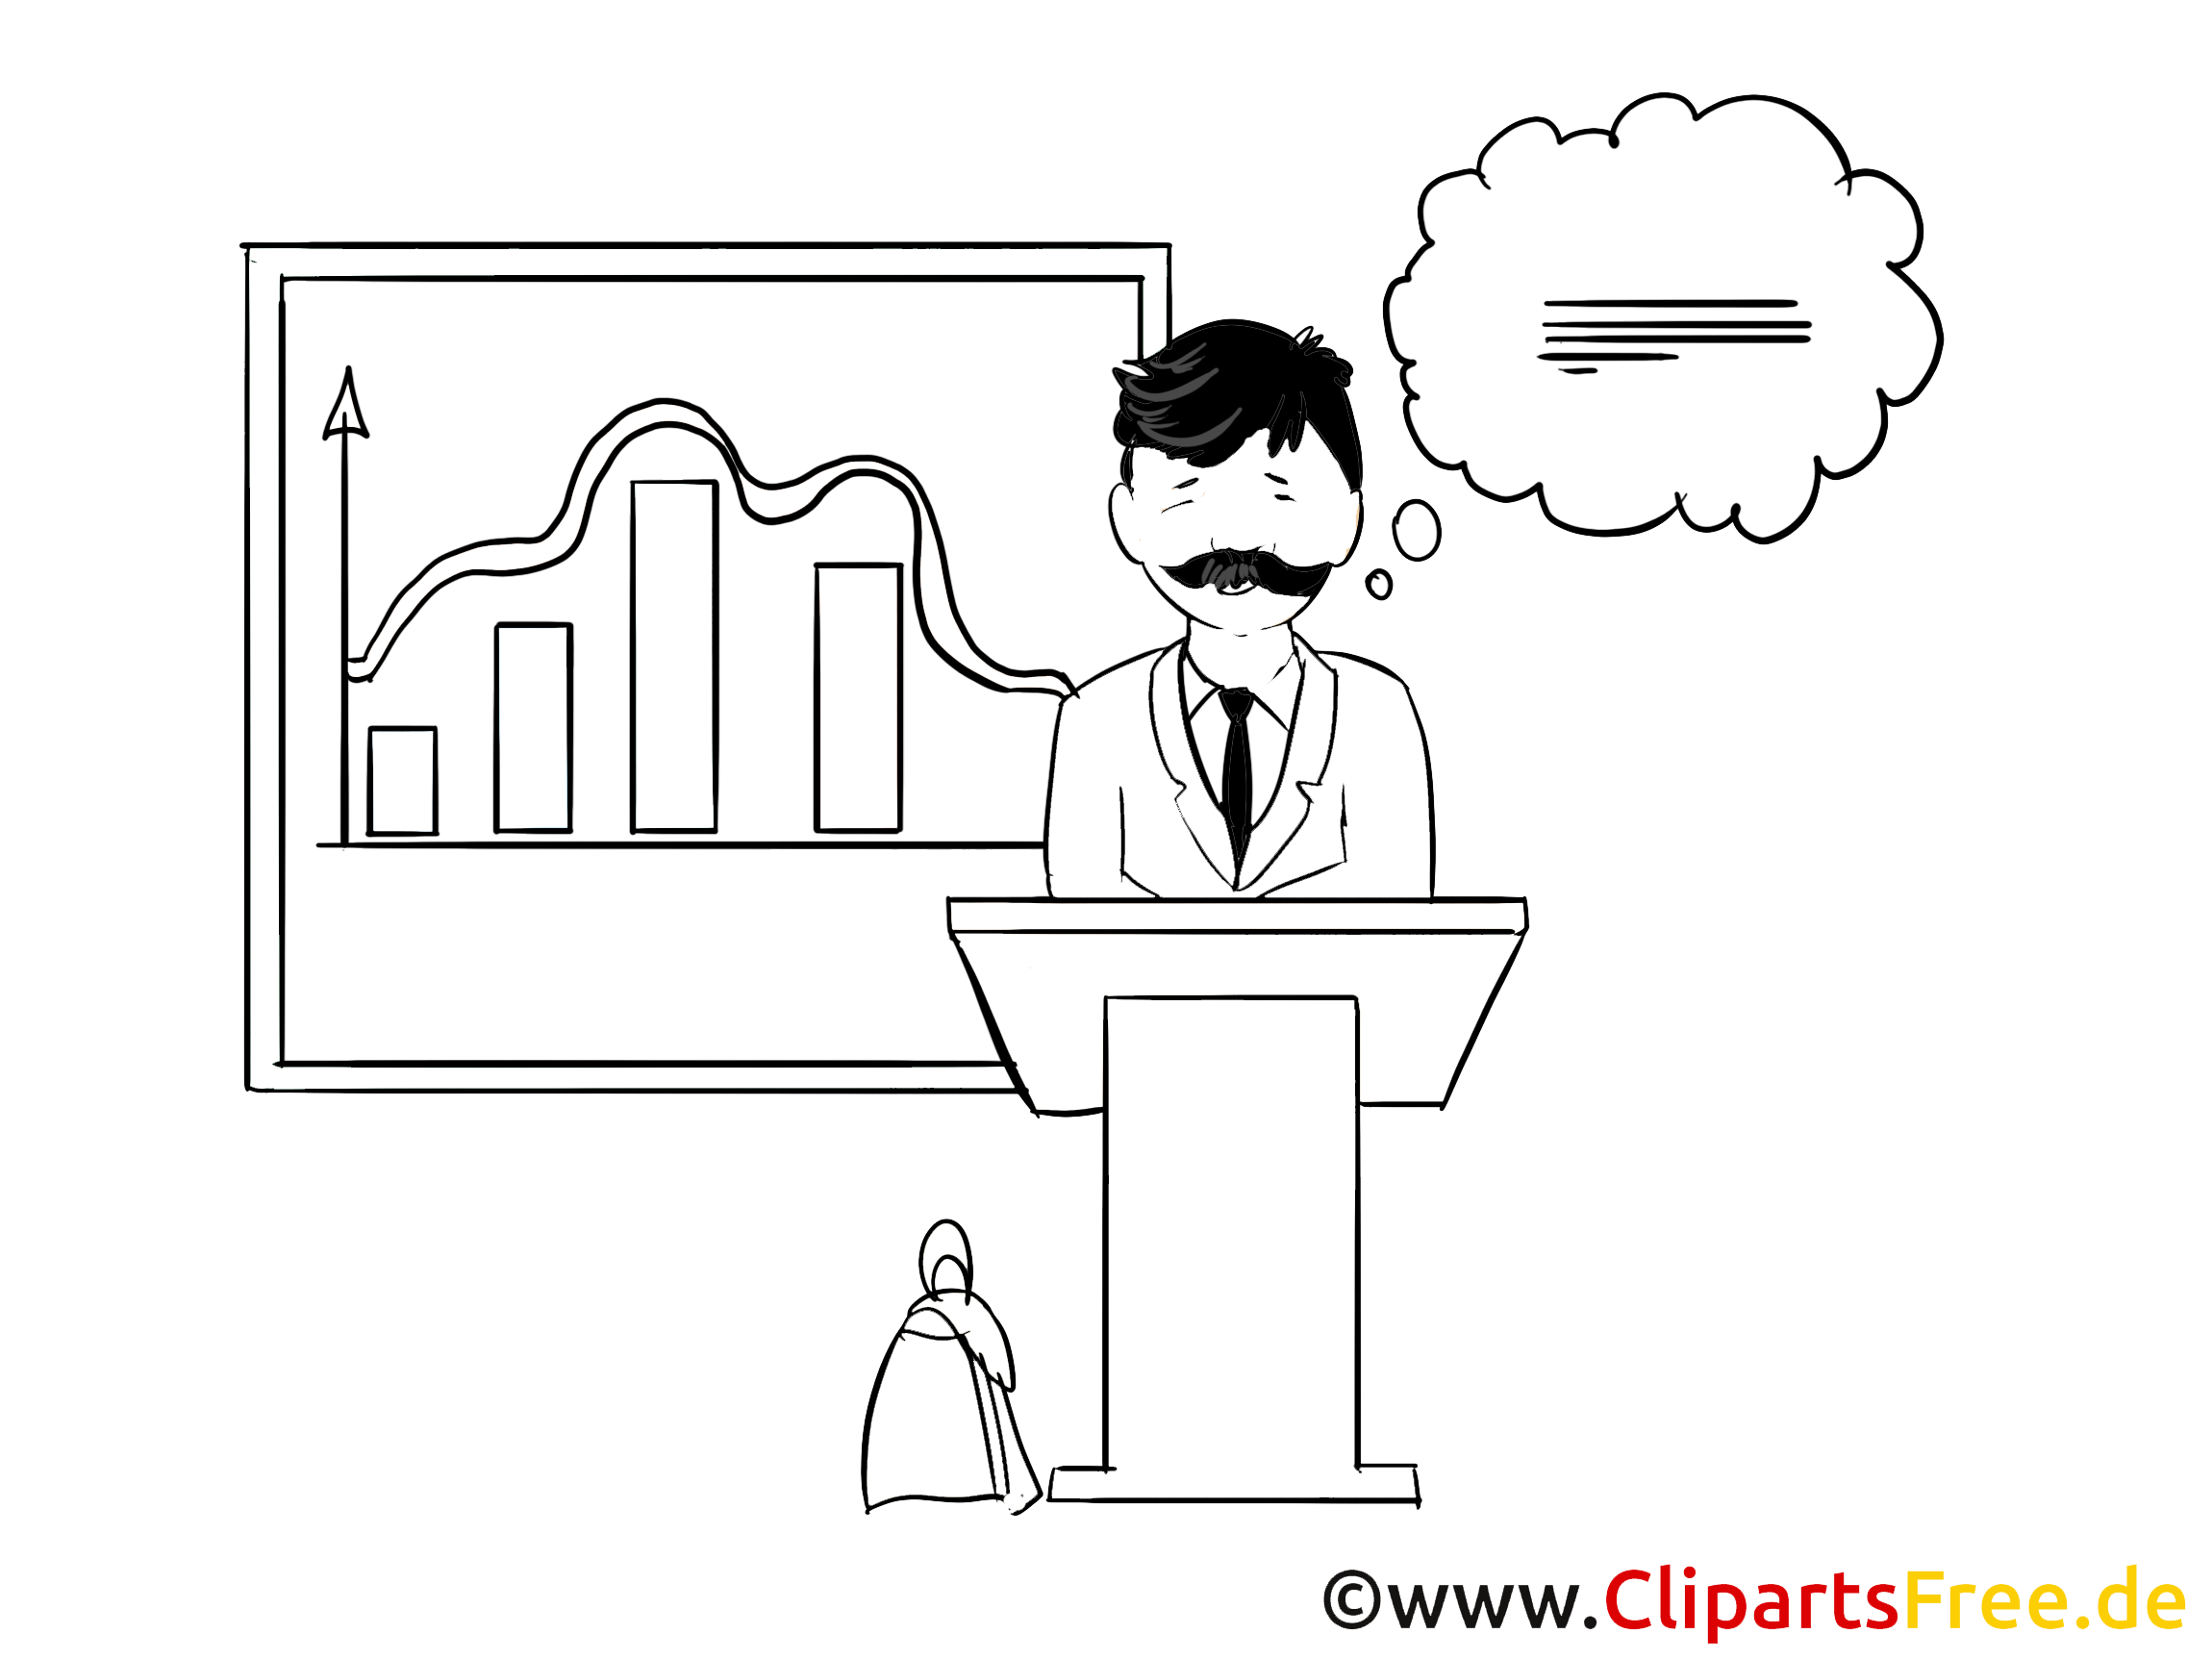 clipart kostenlos präsentation - photo #12